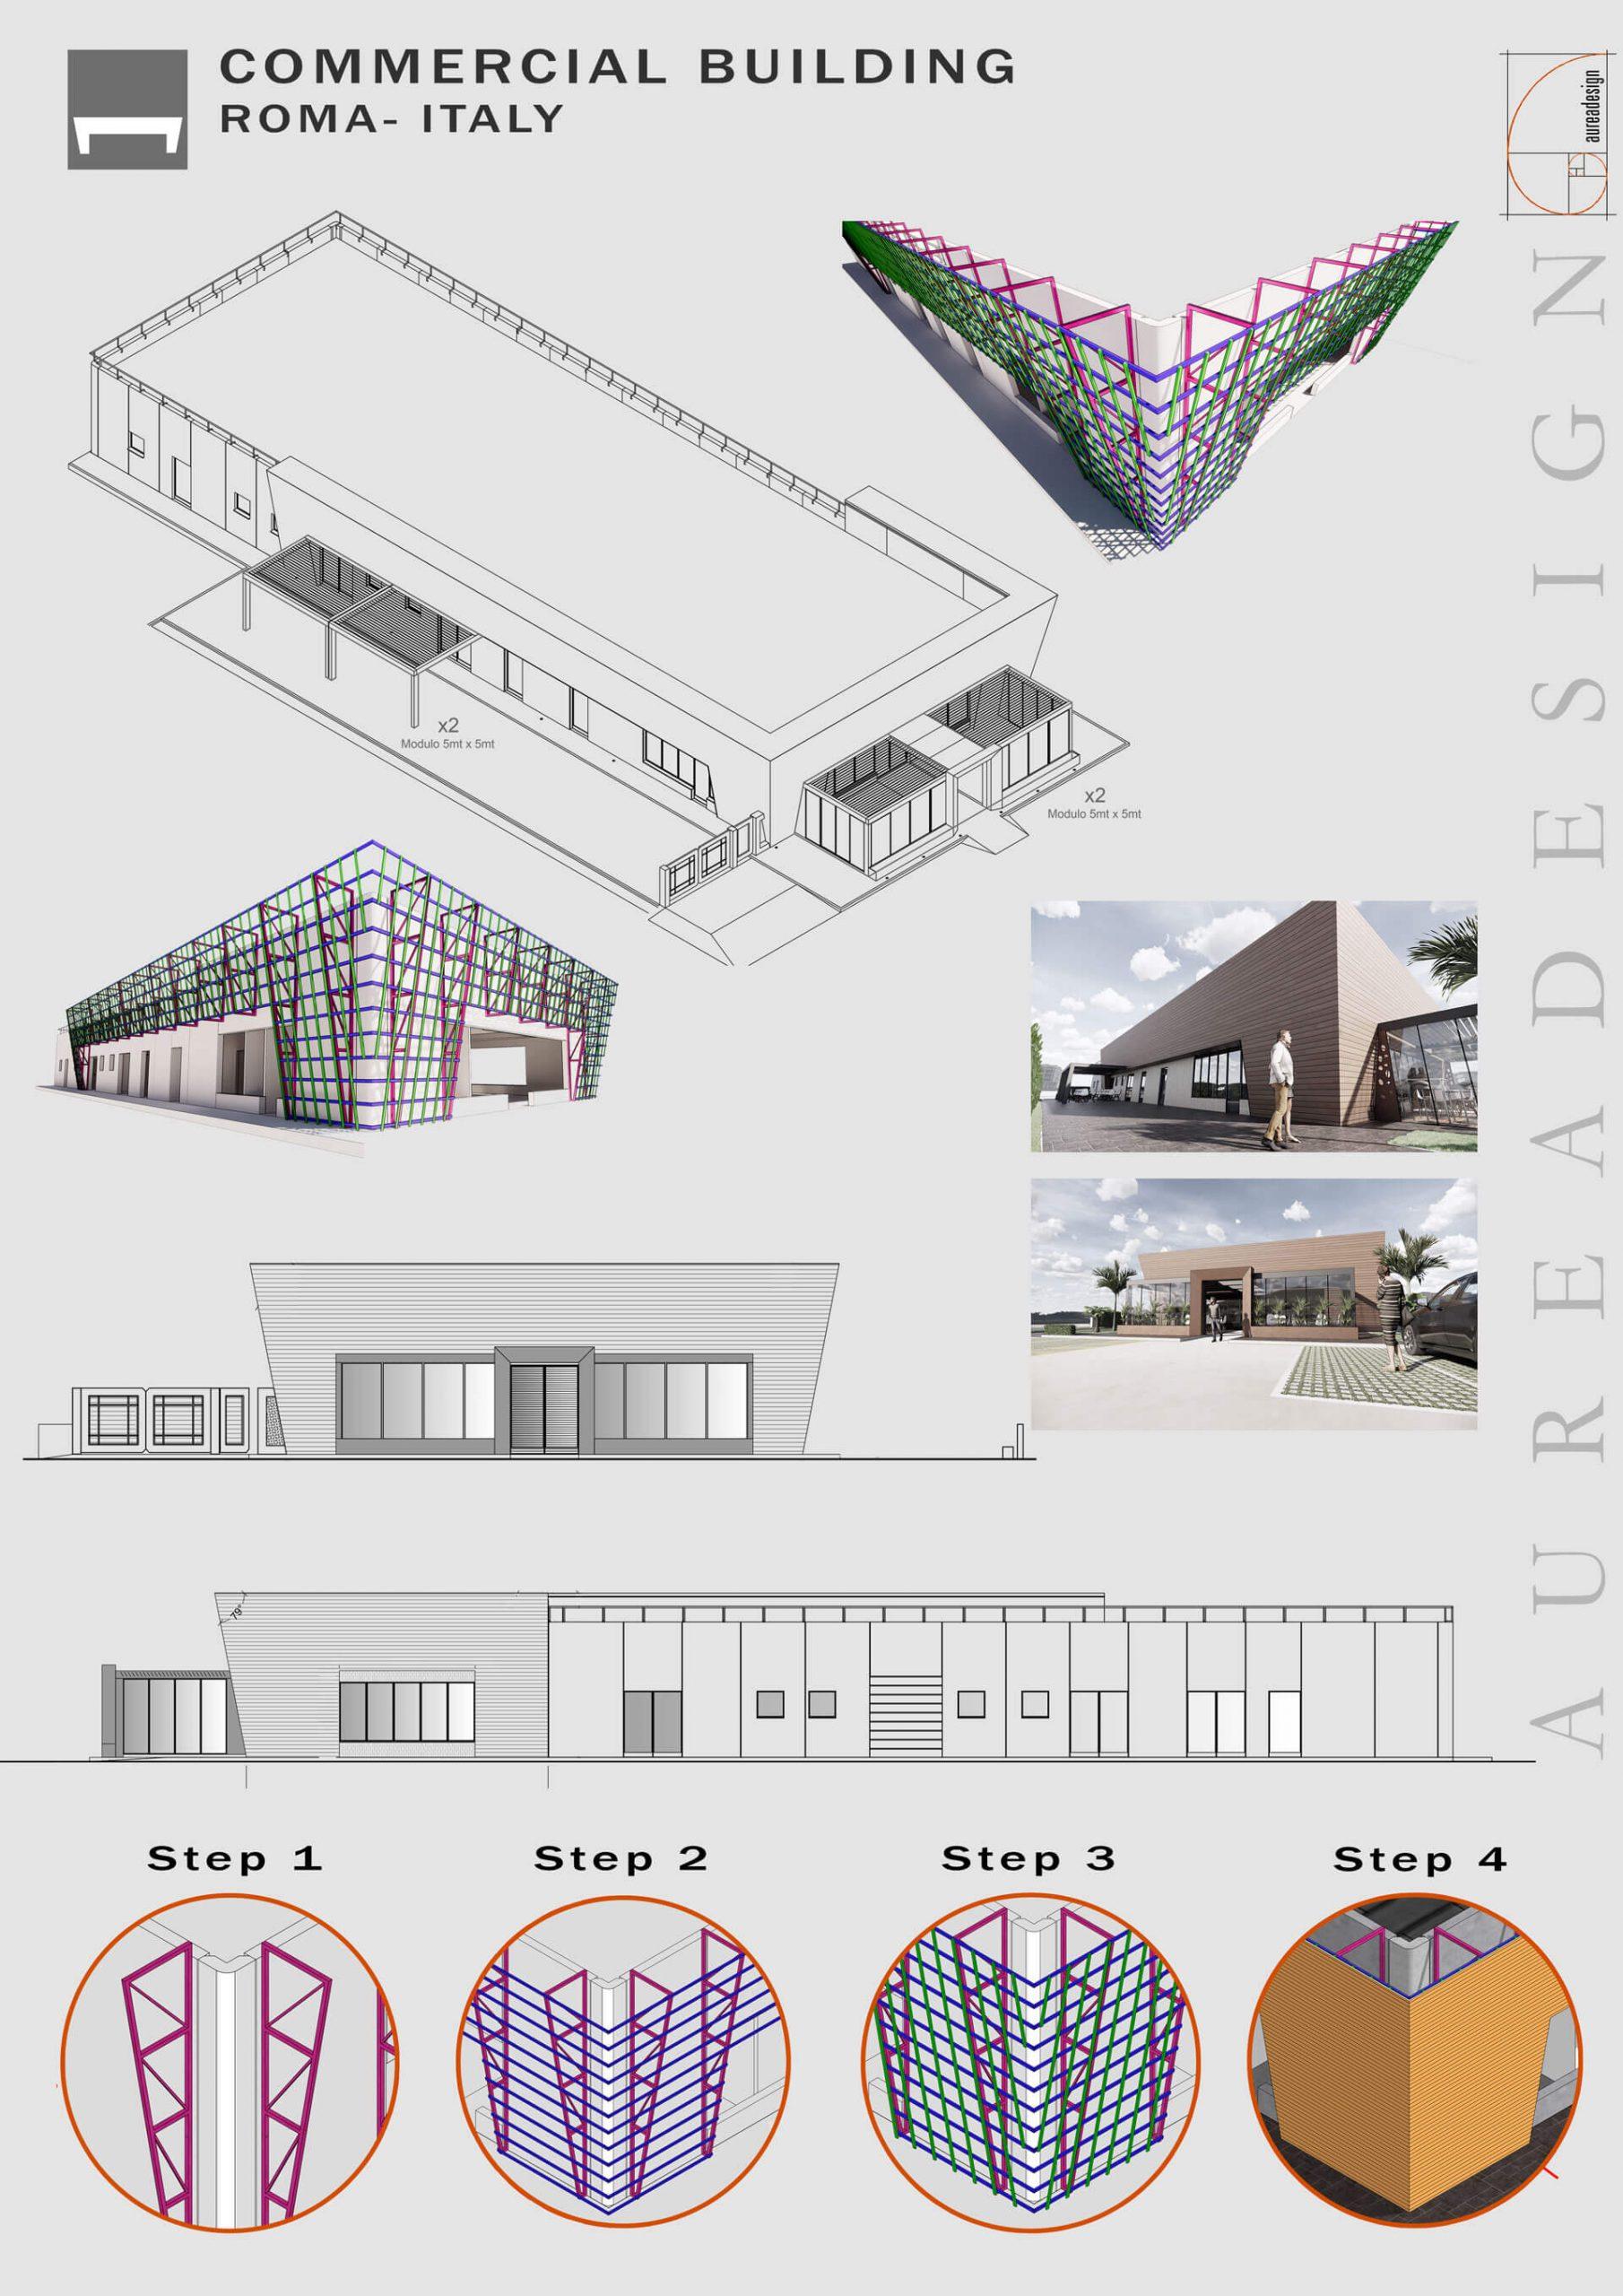 auredesign.com_progettti_commercial_building_00